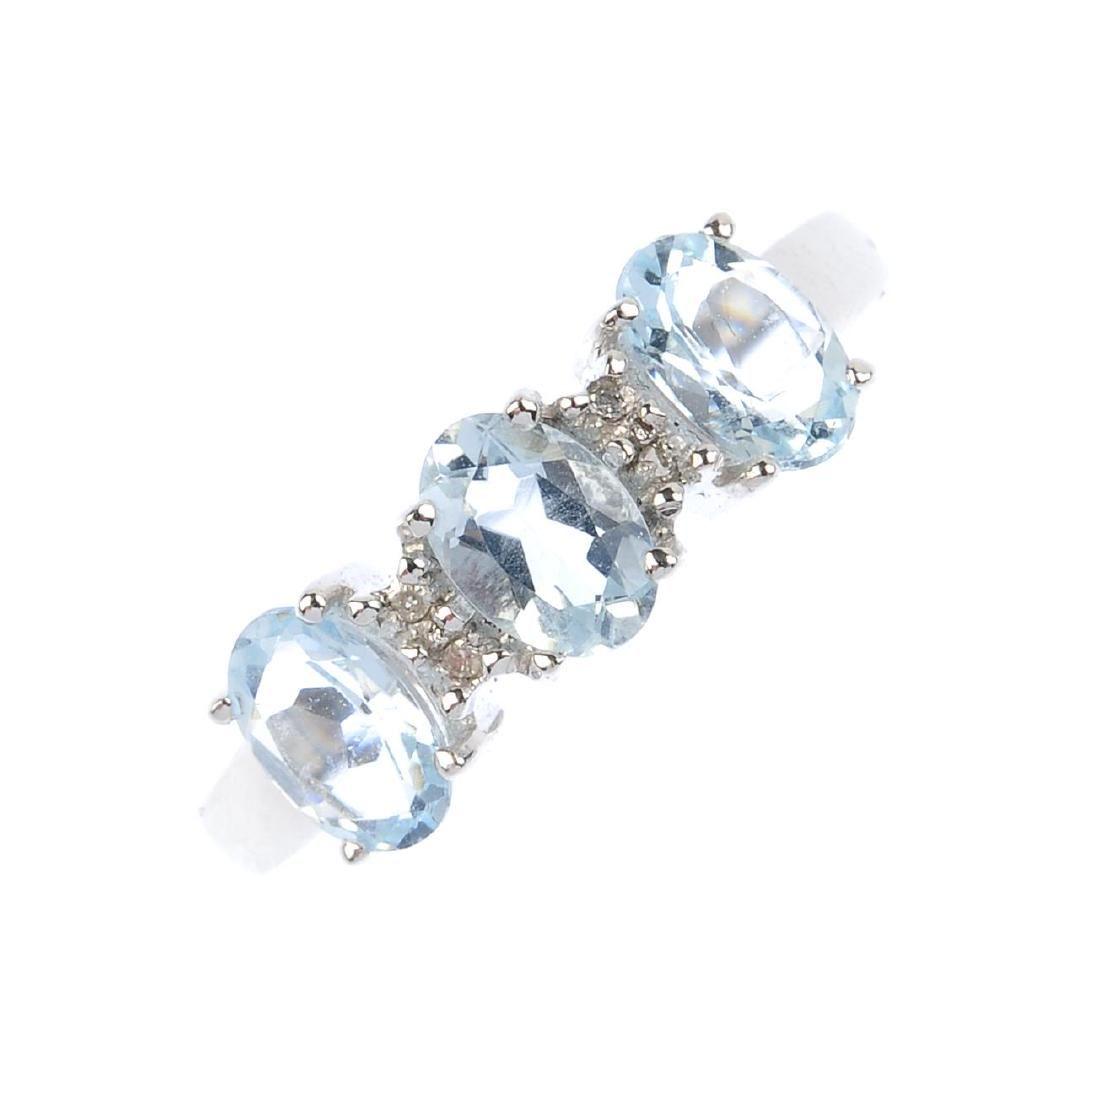 A set of aquamarine and diamond jewellery. The 9ct gold